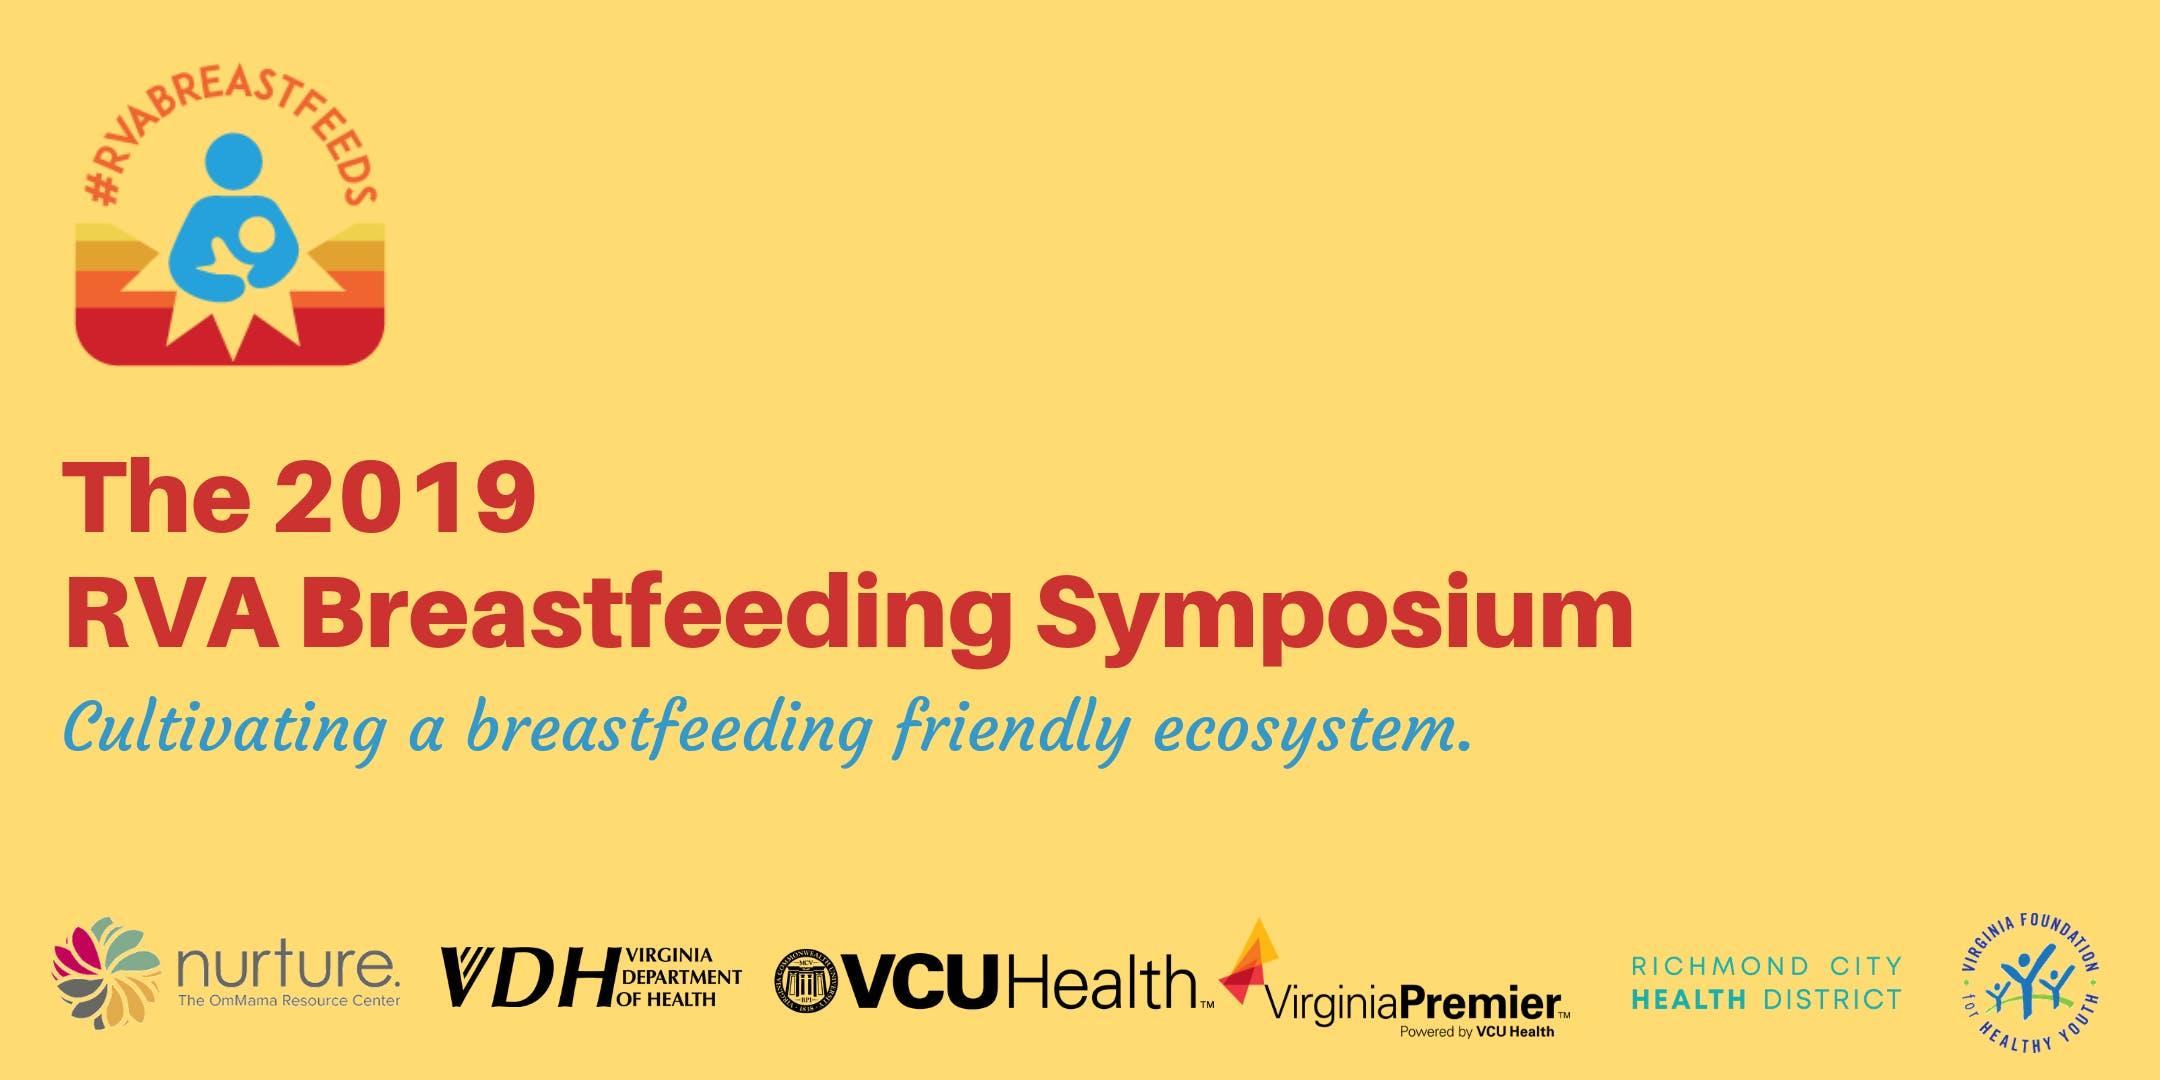 The 2019 RVA Breastfeeding Symposium